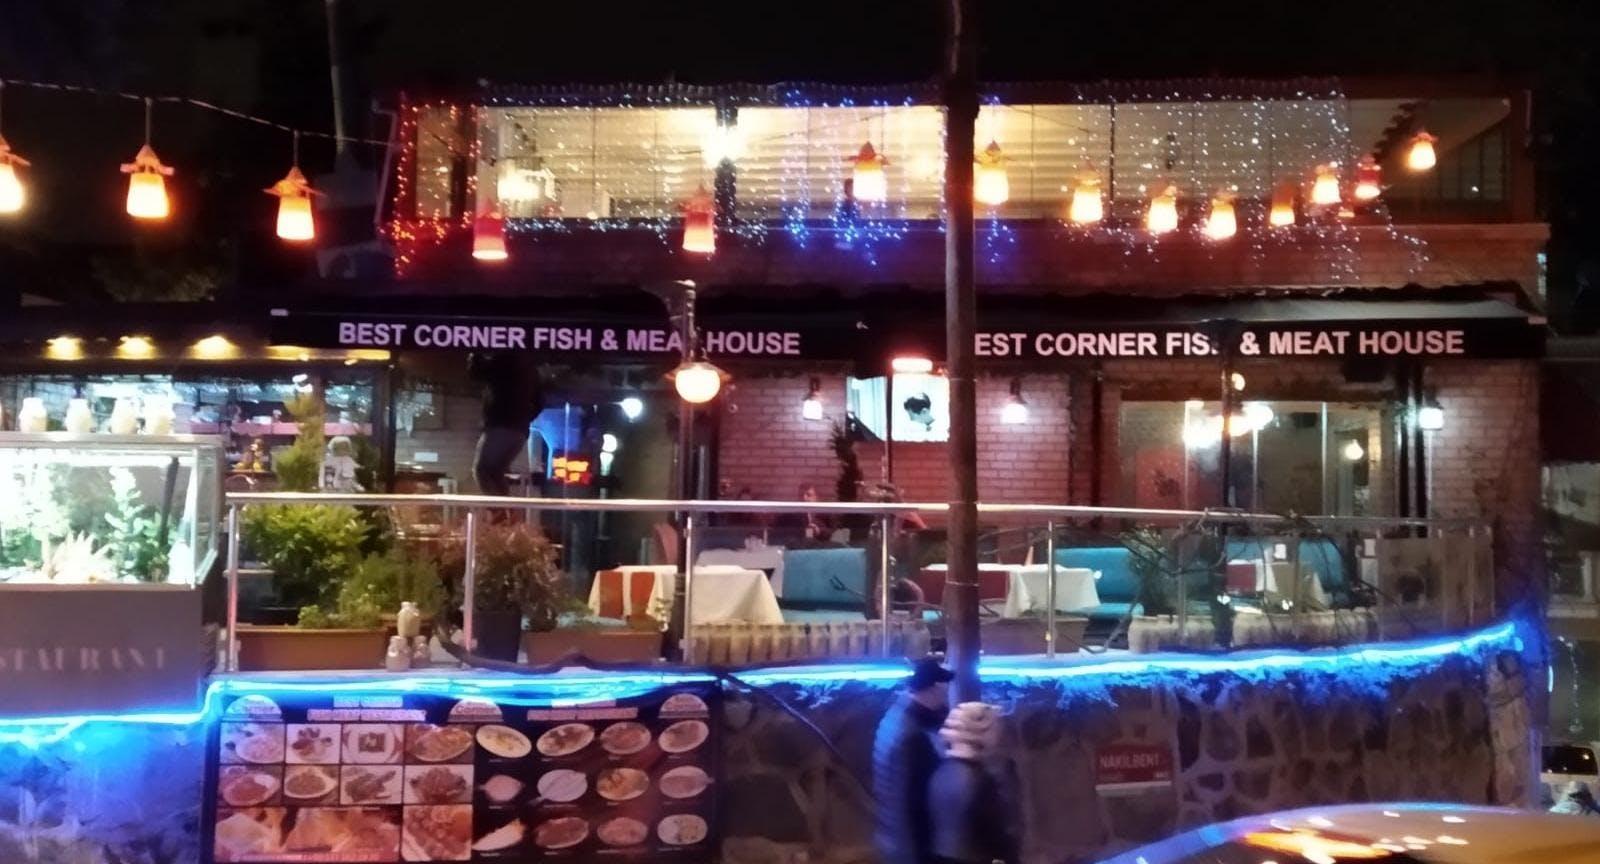 Best Corner Fish & Meat Restaurant